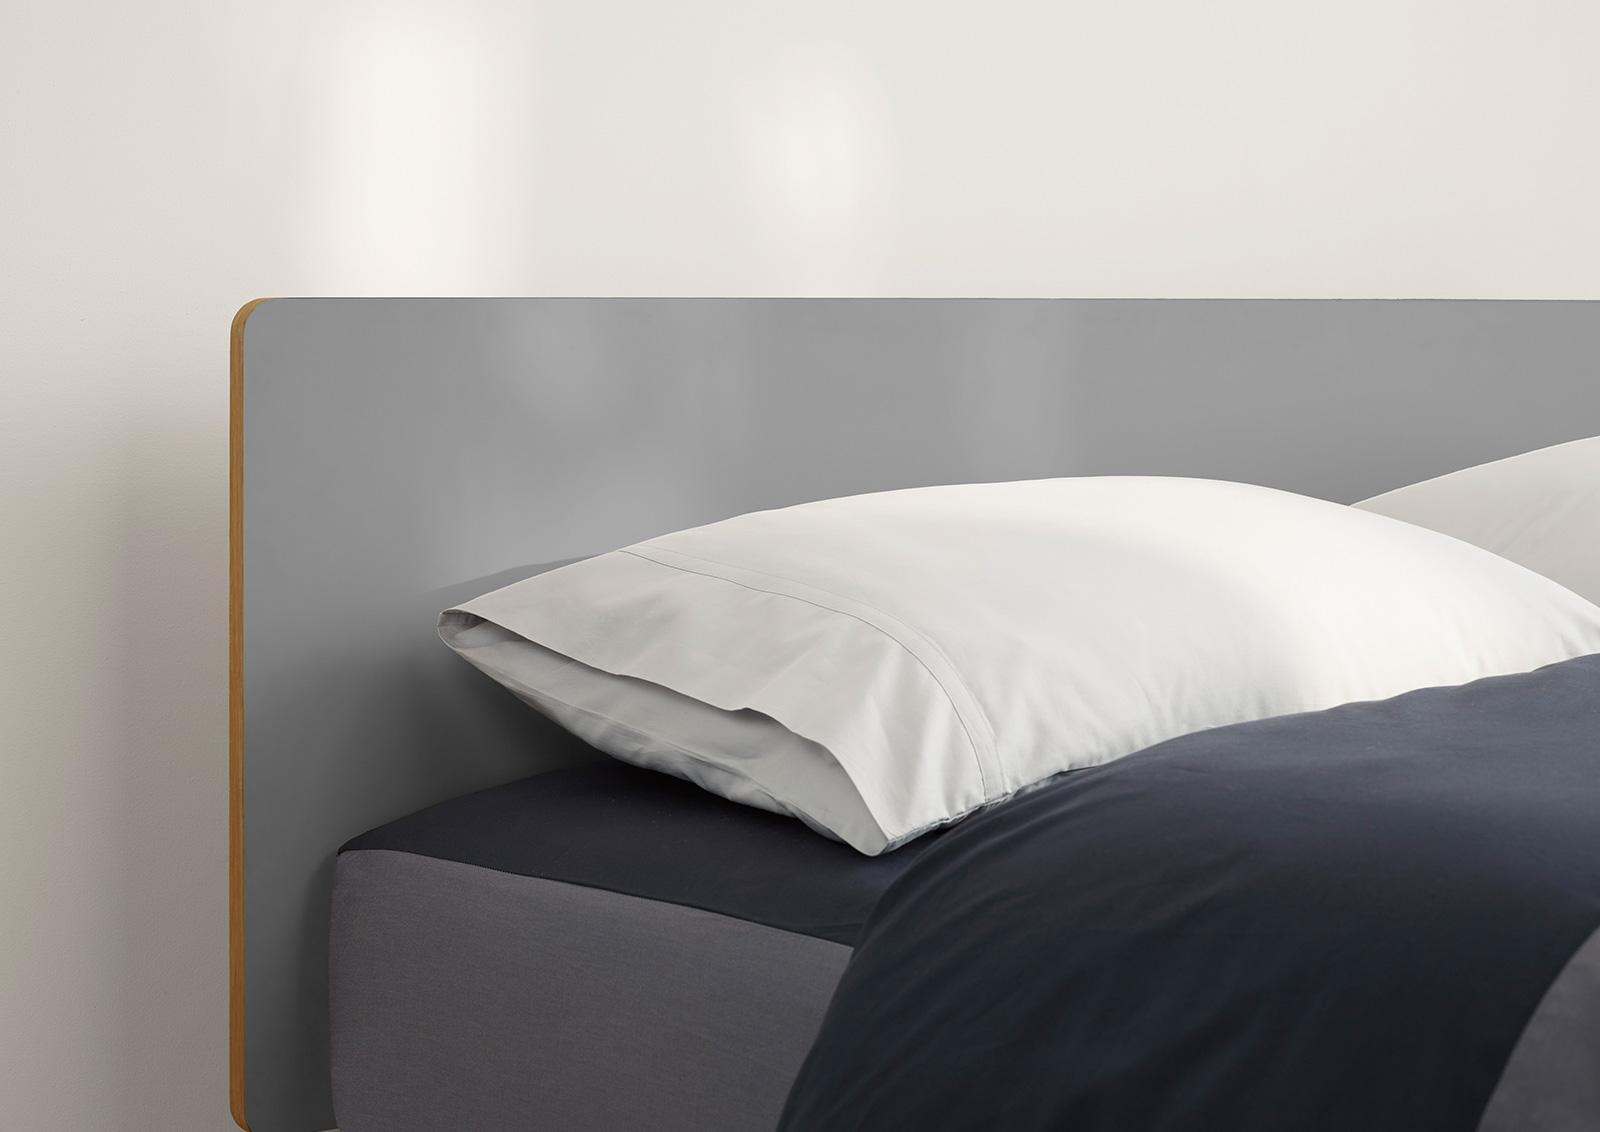 The Headboard Casper Choose Between 3 Beautiful Color Finishes Casper